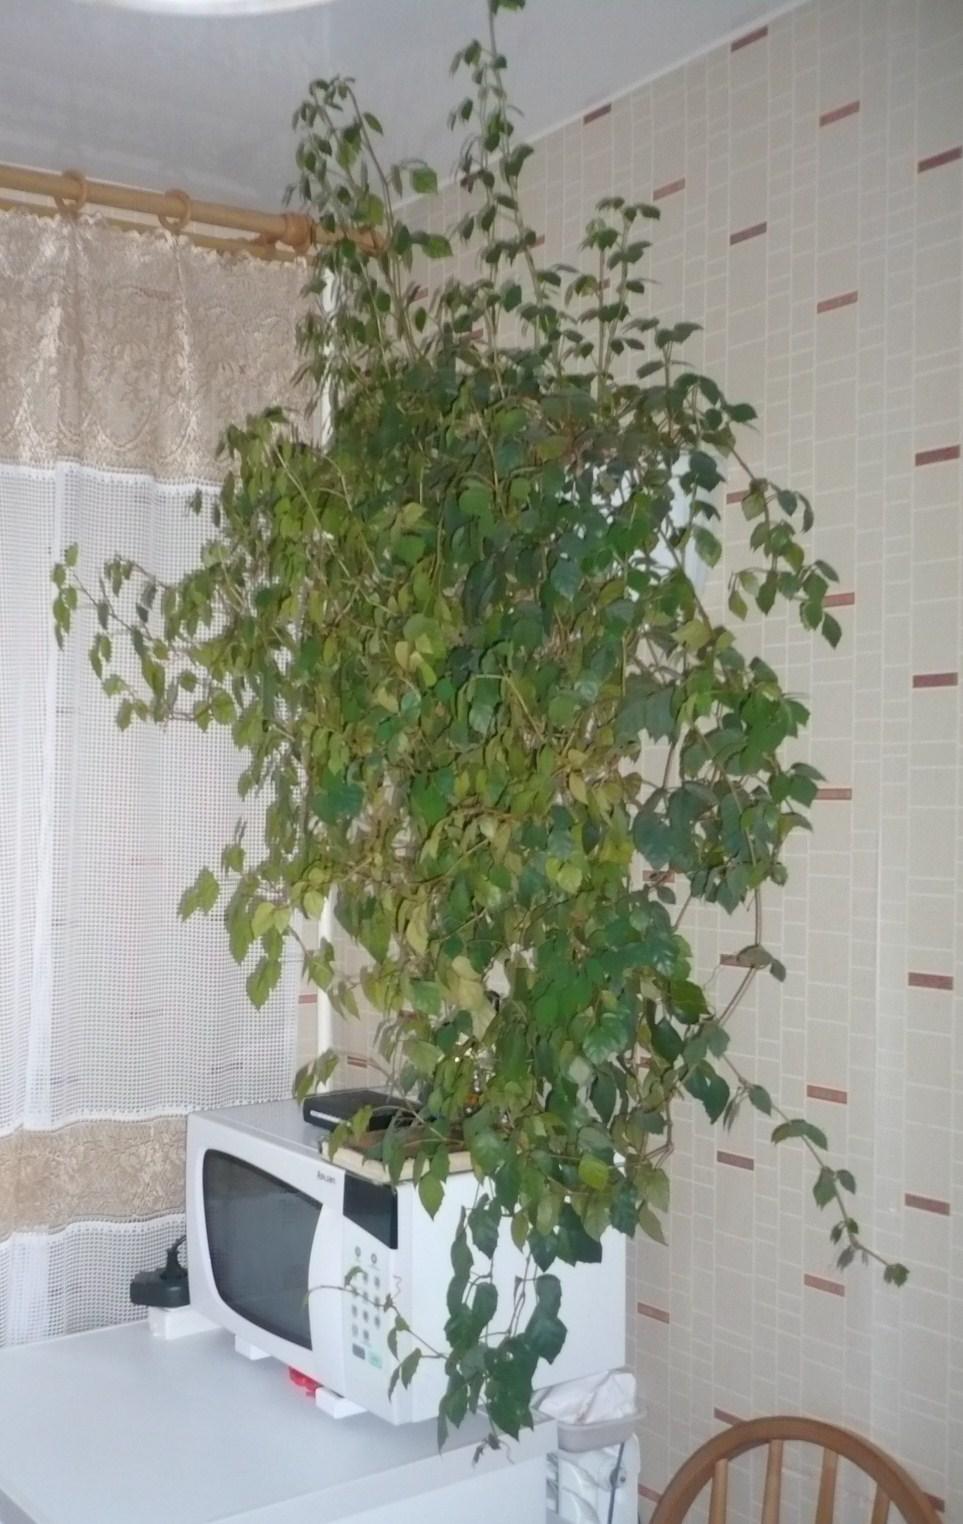 Березка (комнатное растение посадка, уход, размножение) 42